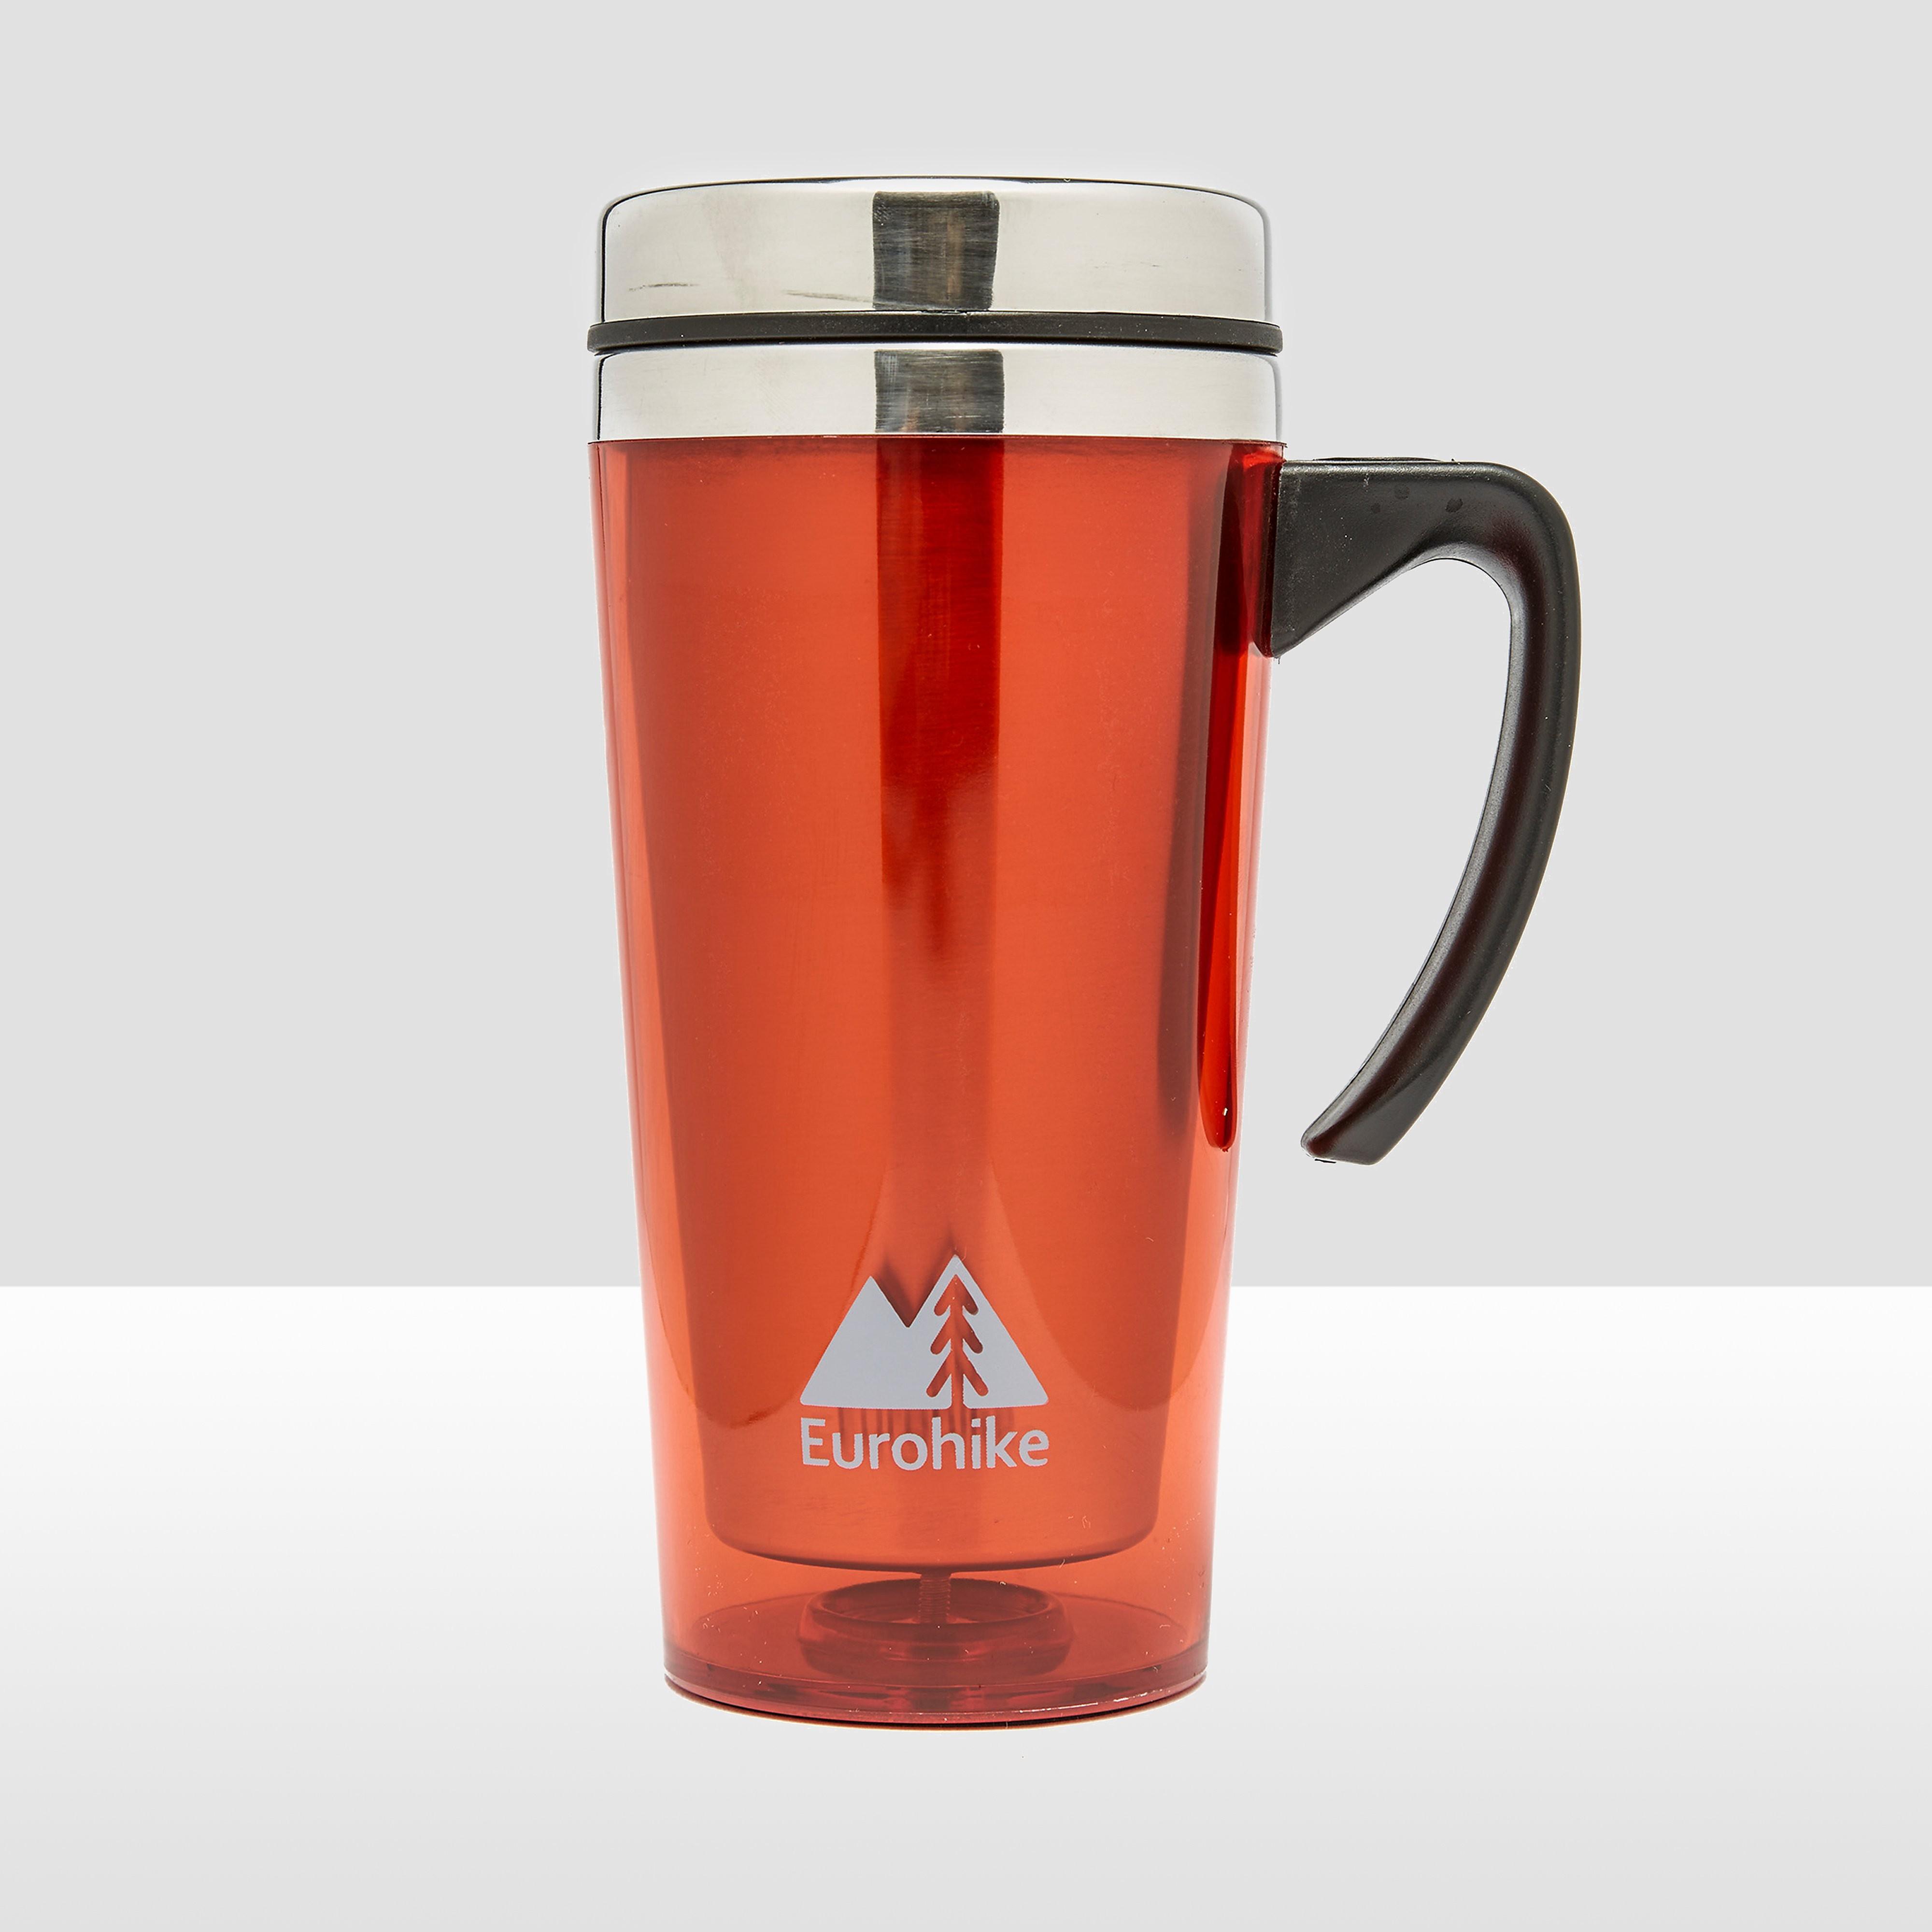 Eurohike Tall Insulated Mug